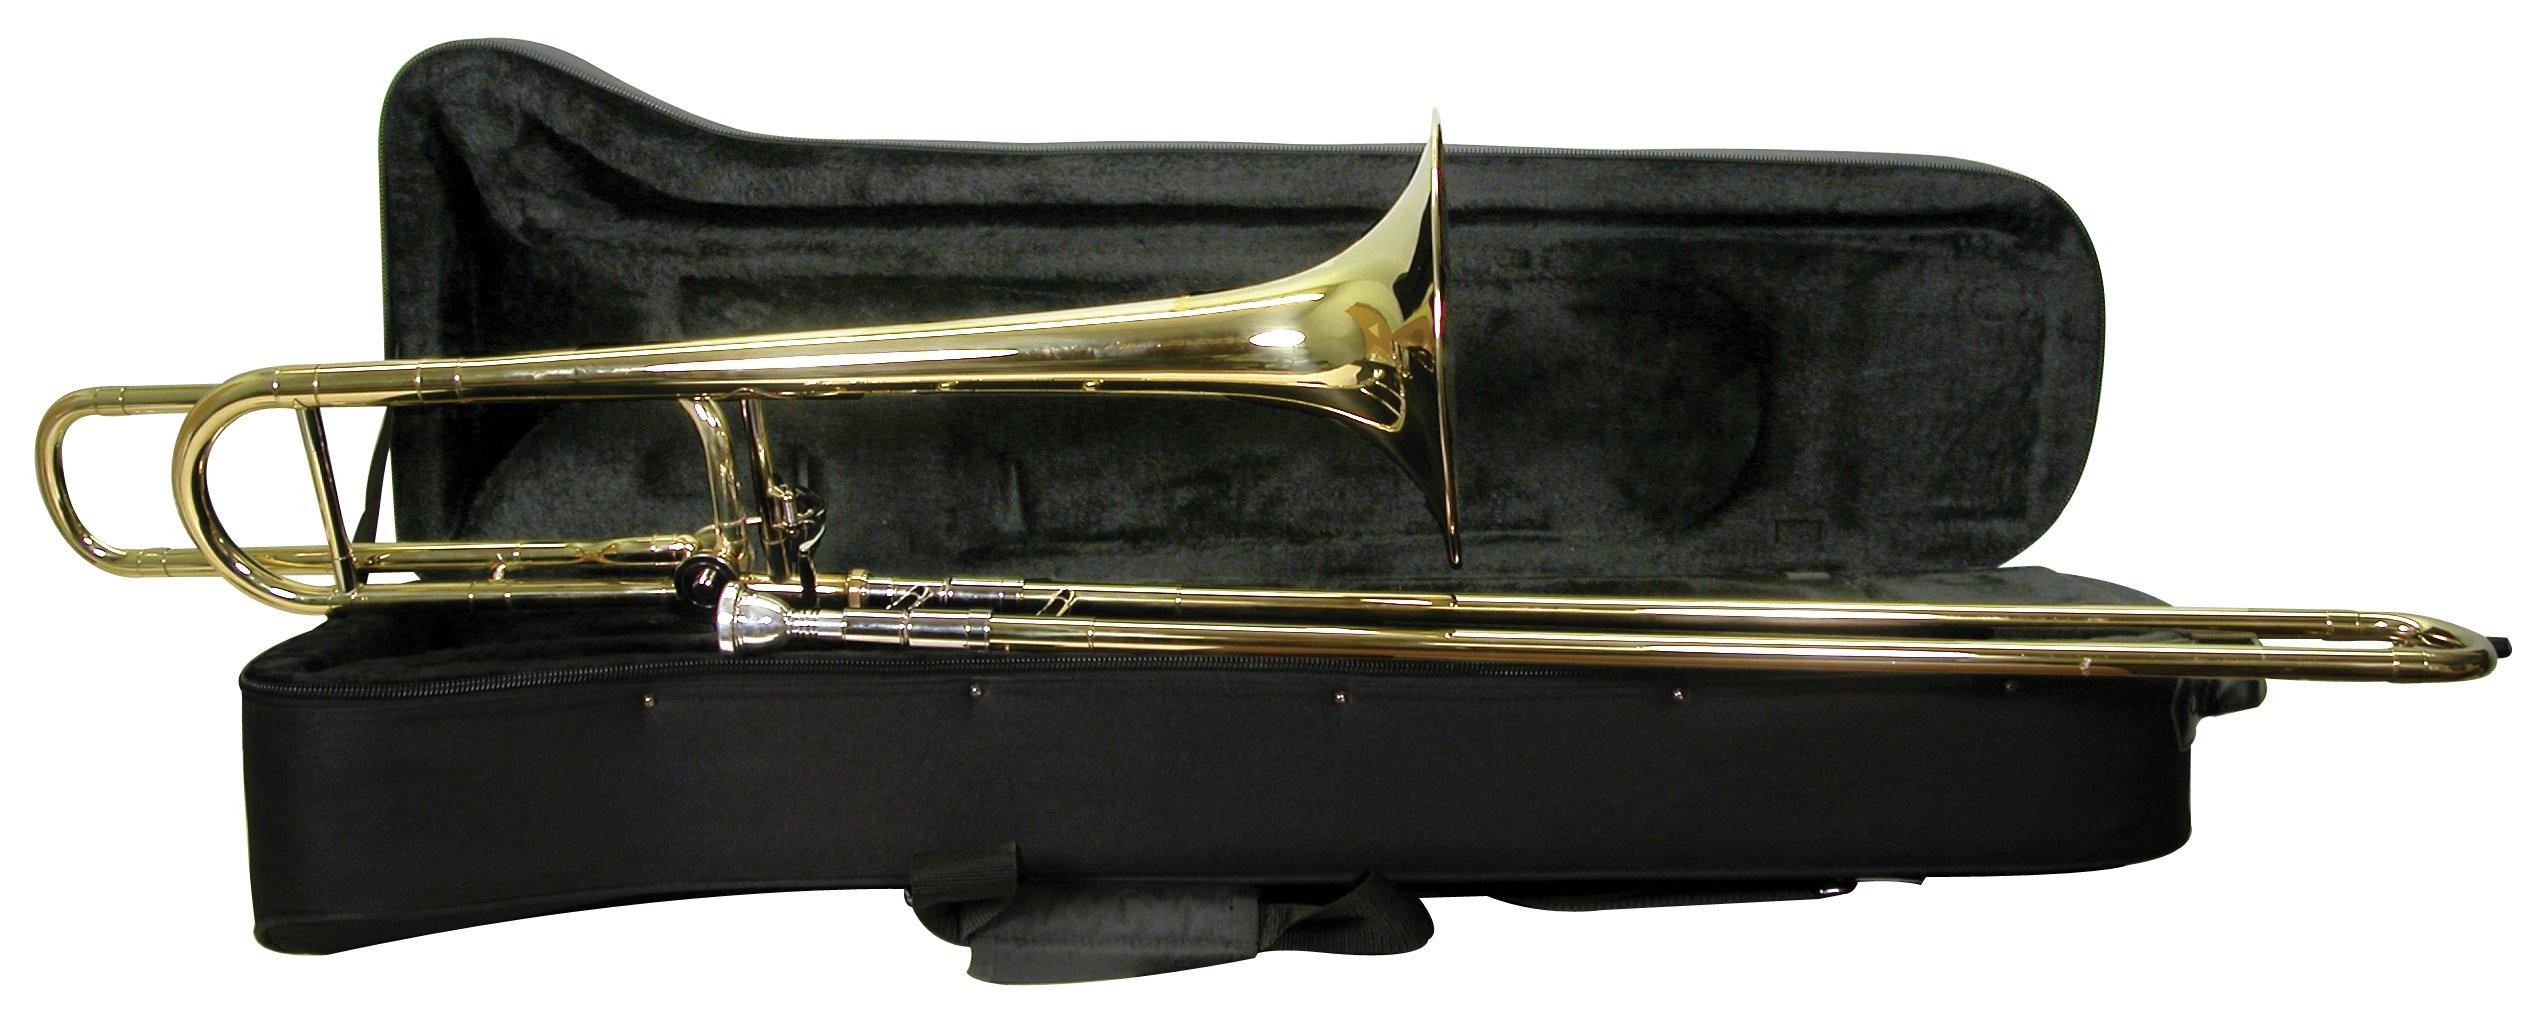 Mirage TT61 Deluxe Bb Slide Trombone with Case by Mirage